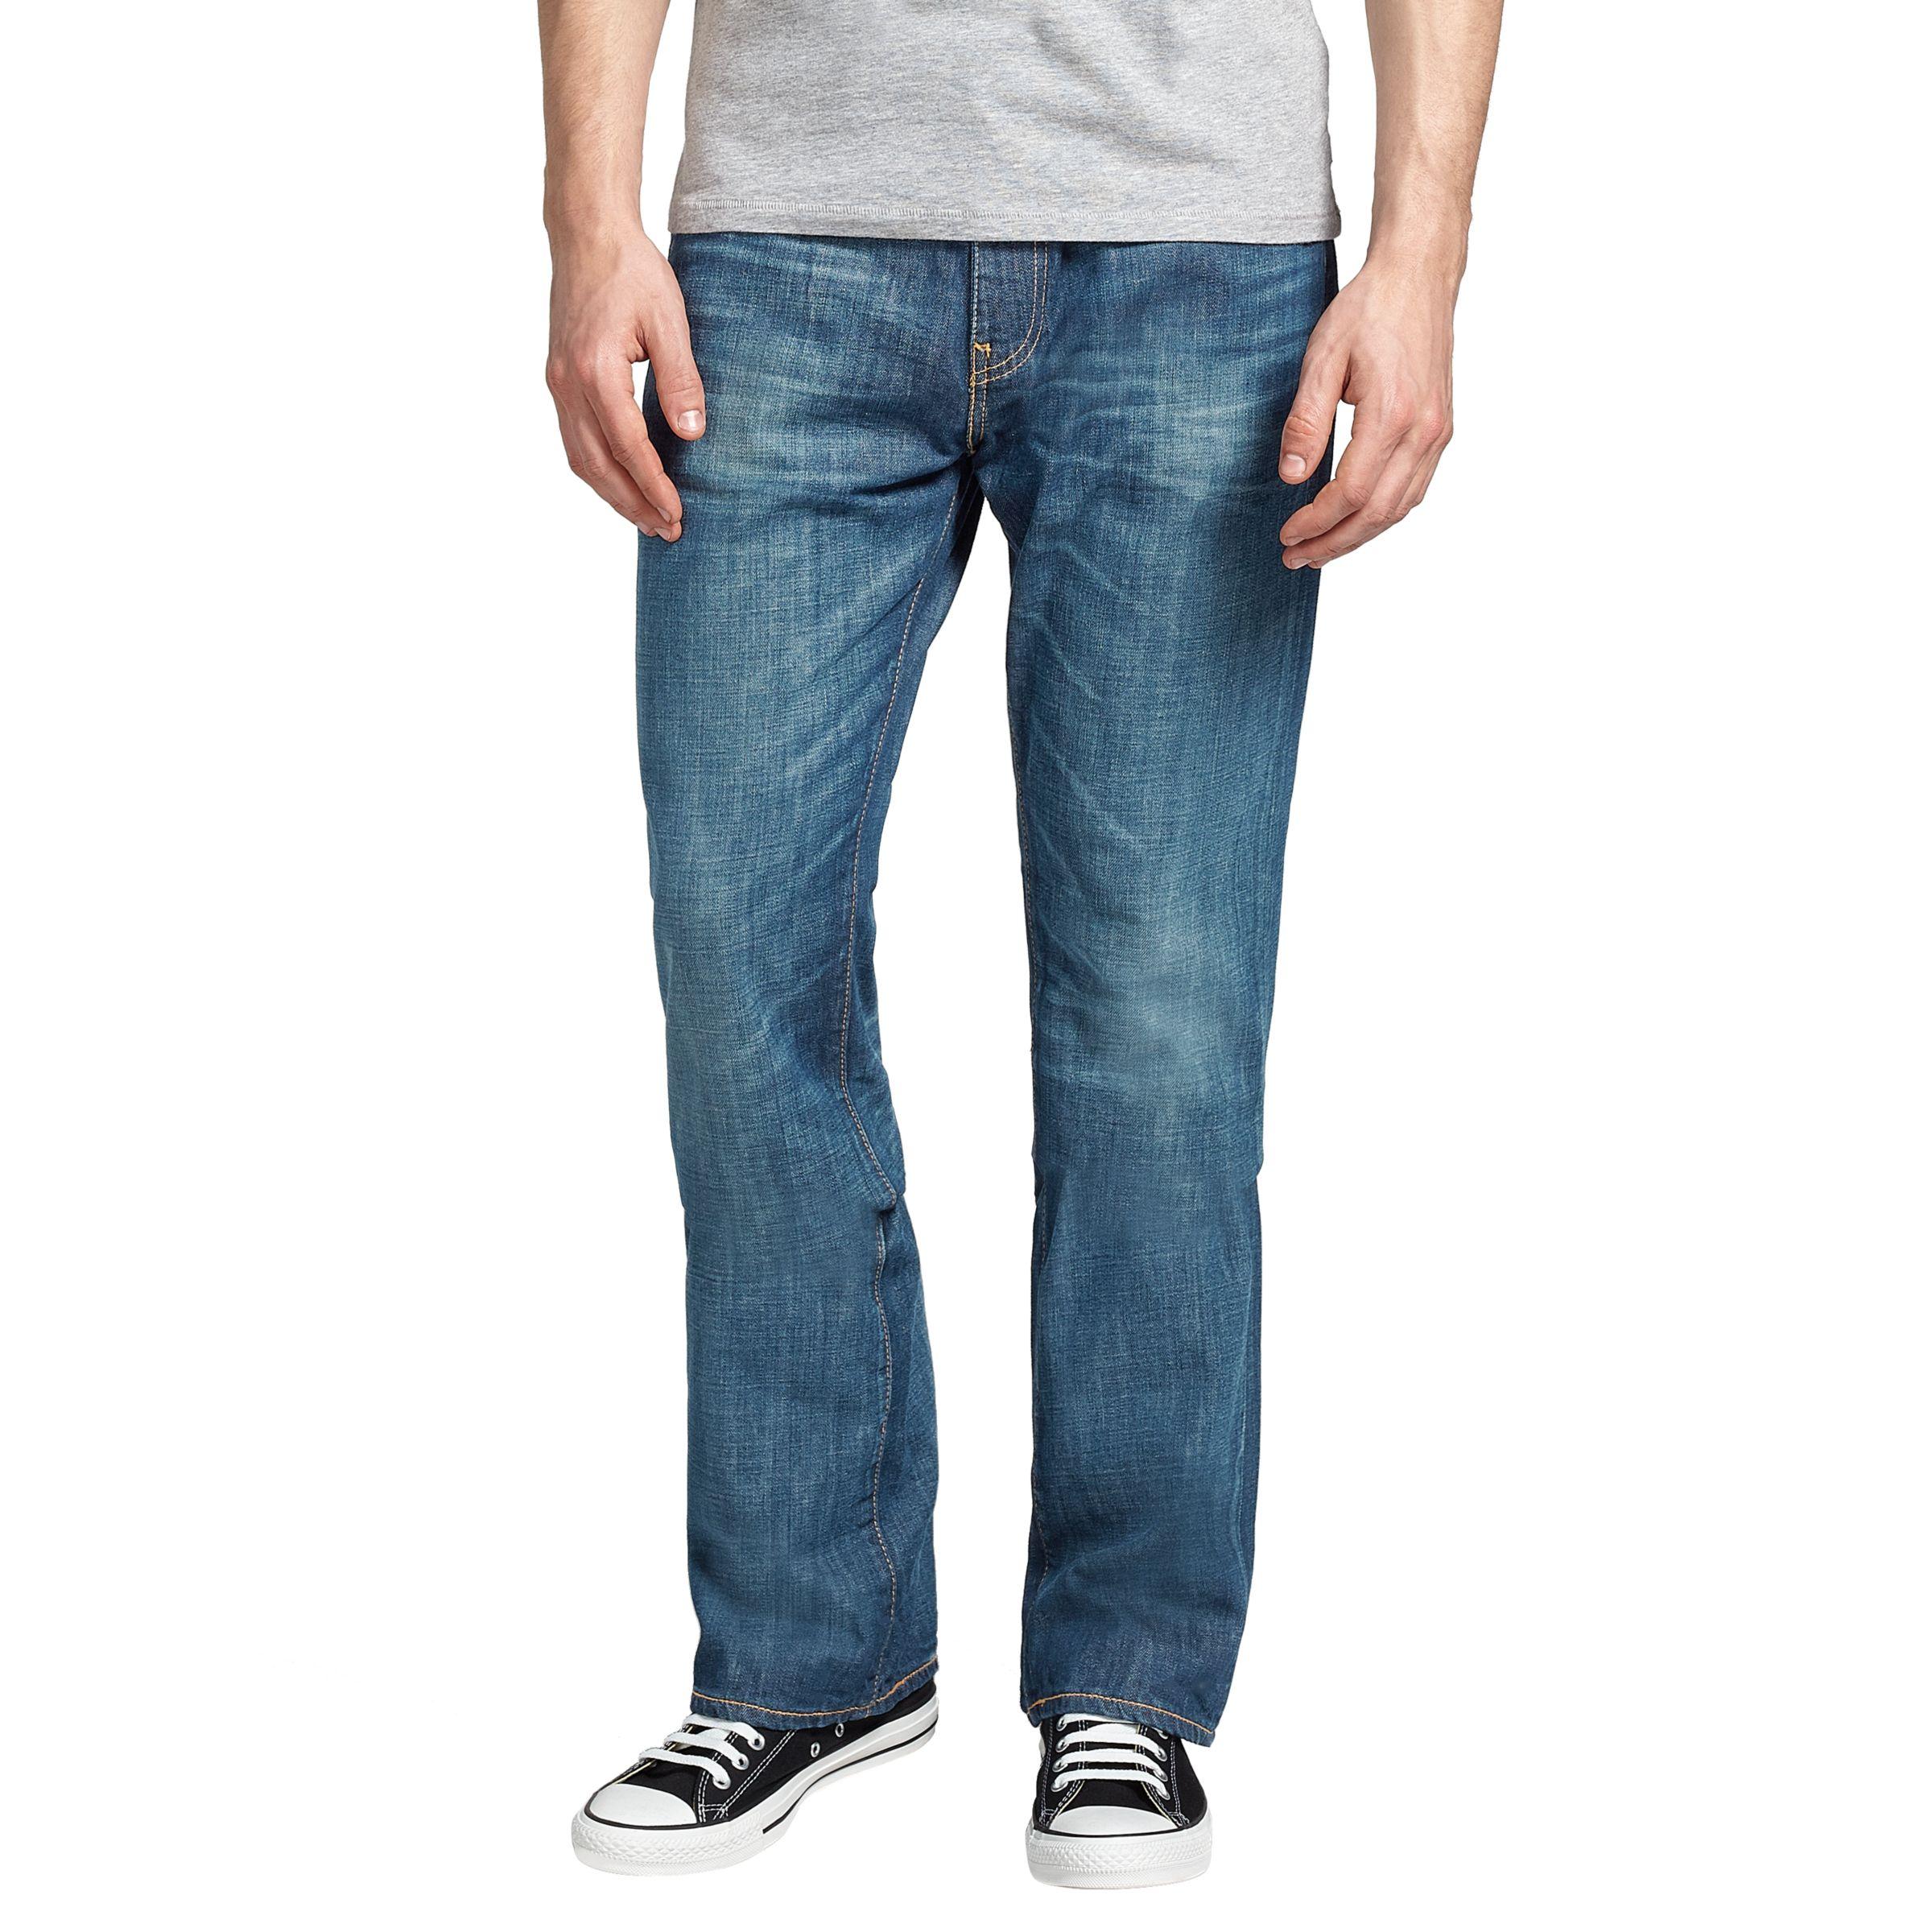 a04e5cb8ead Levi's 527 Bootcut Jeans, Explorer at John Lewis & Partners